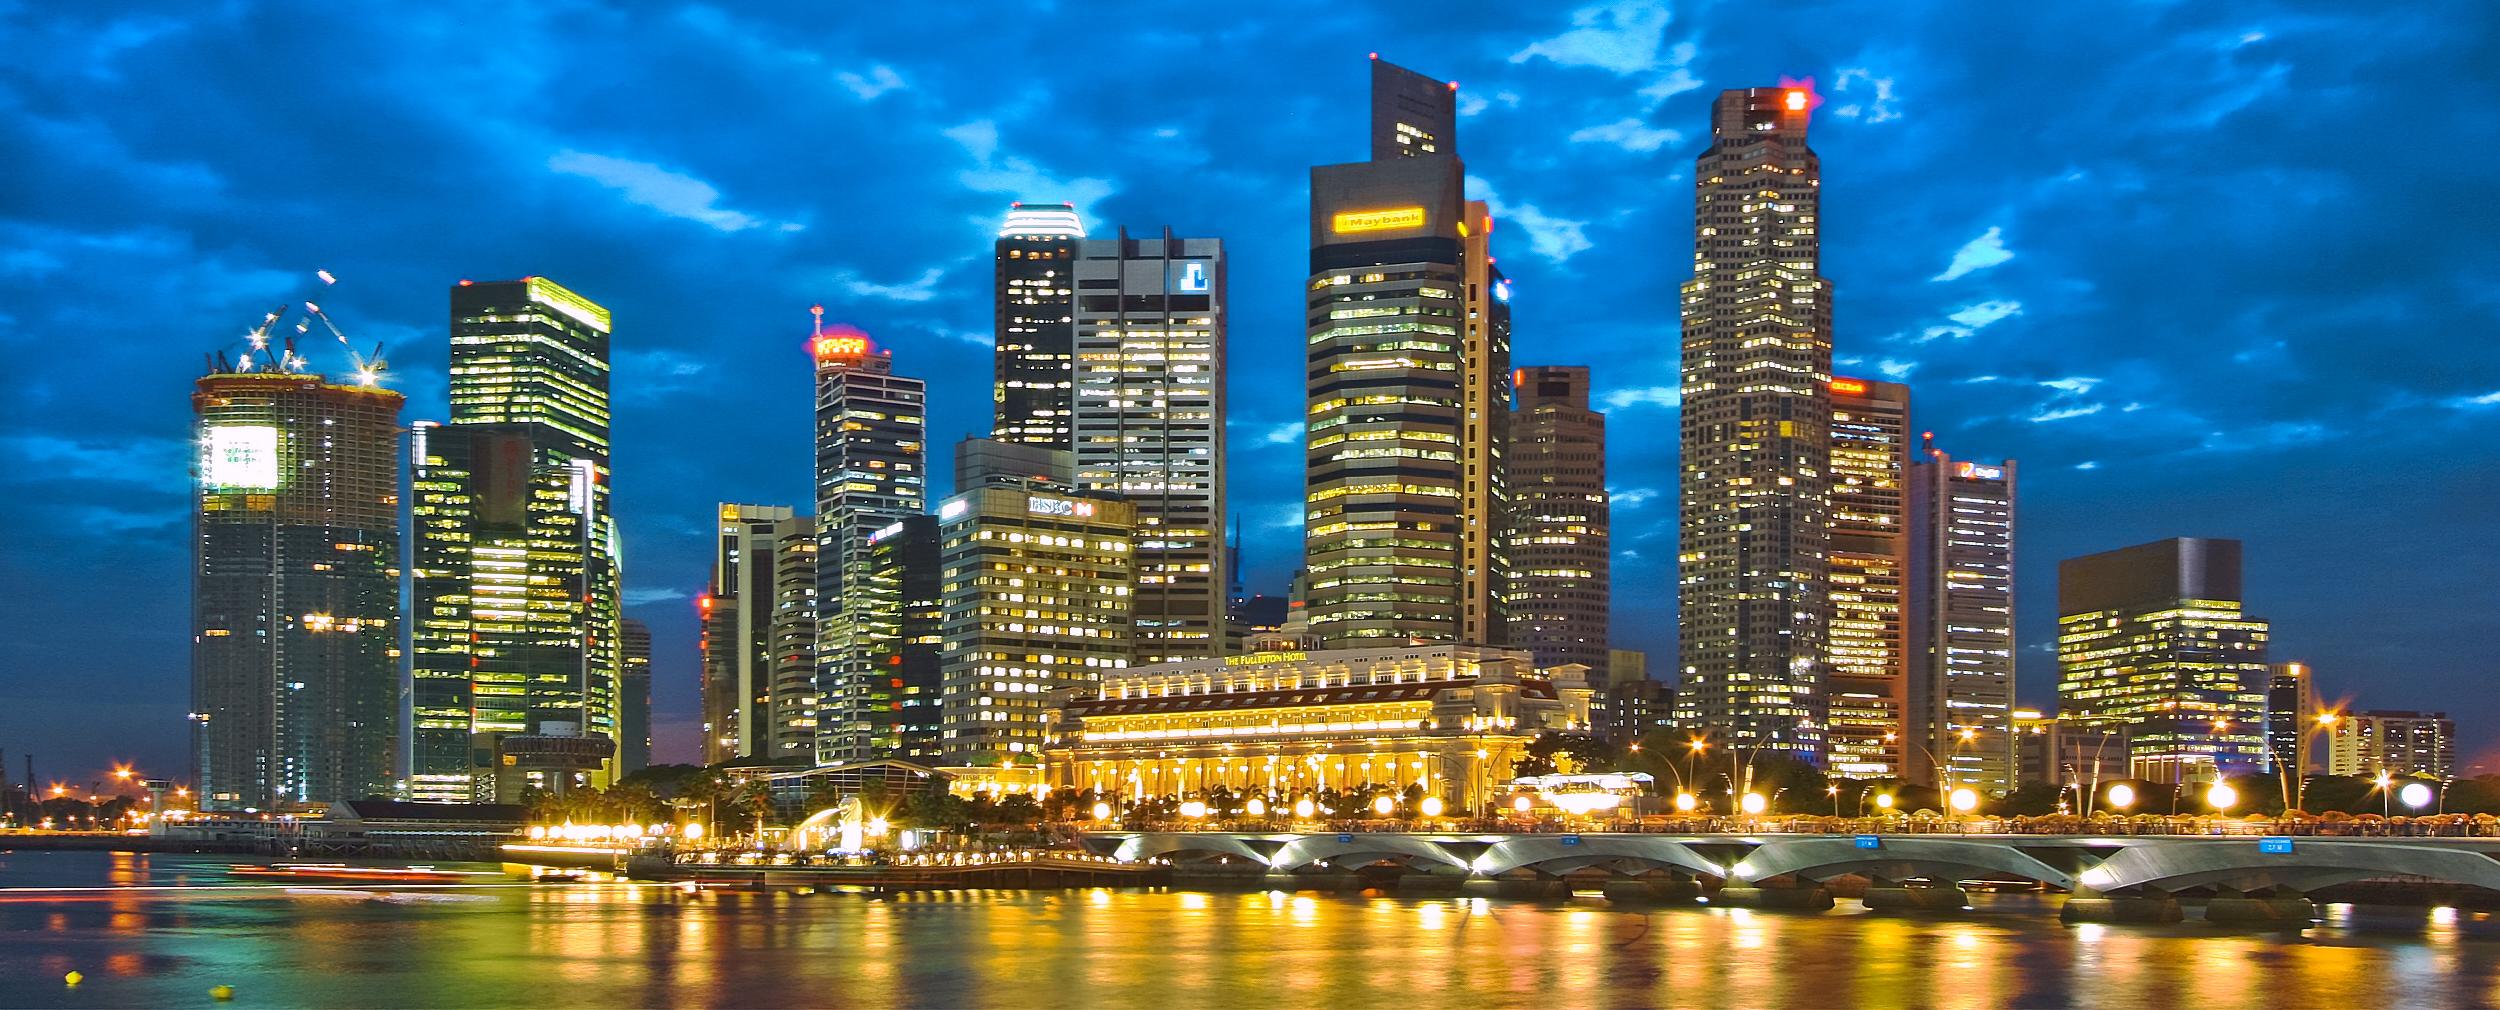 Singapore skyline (Photo via Wikimedia Commons)